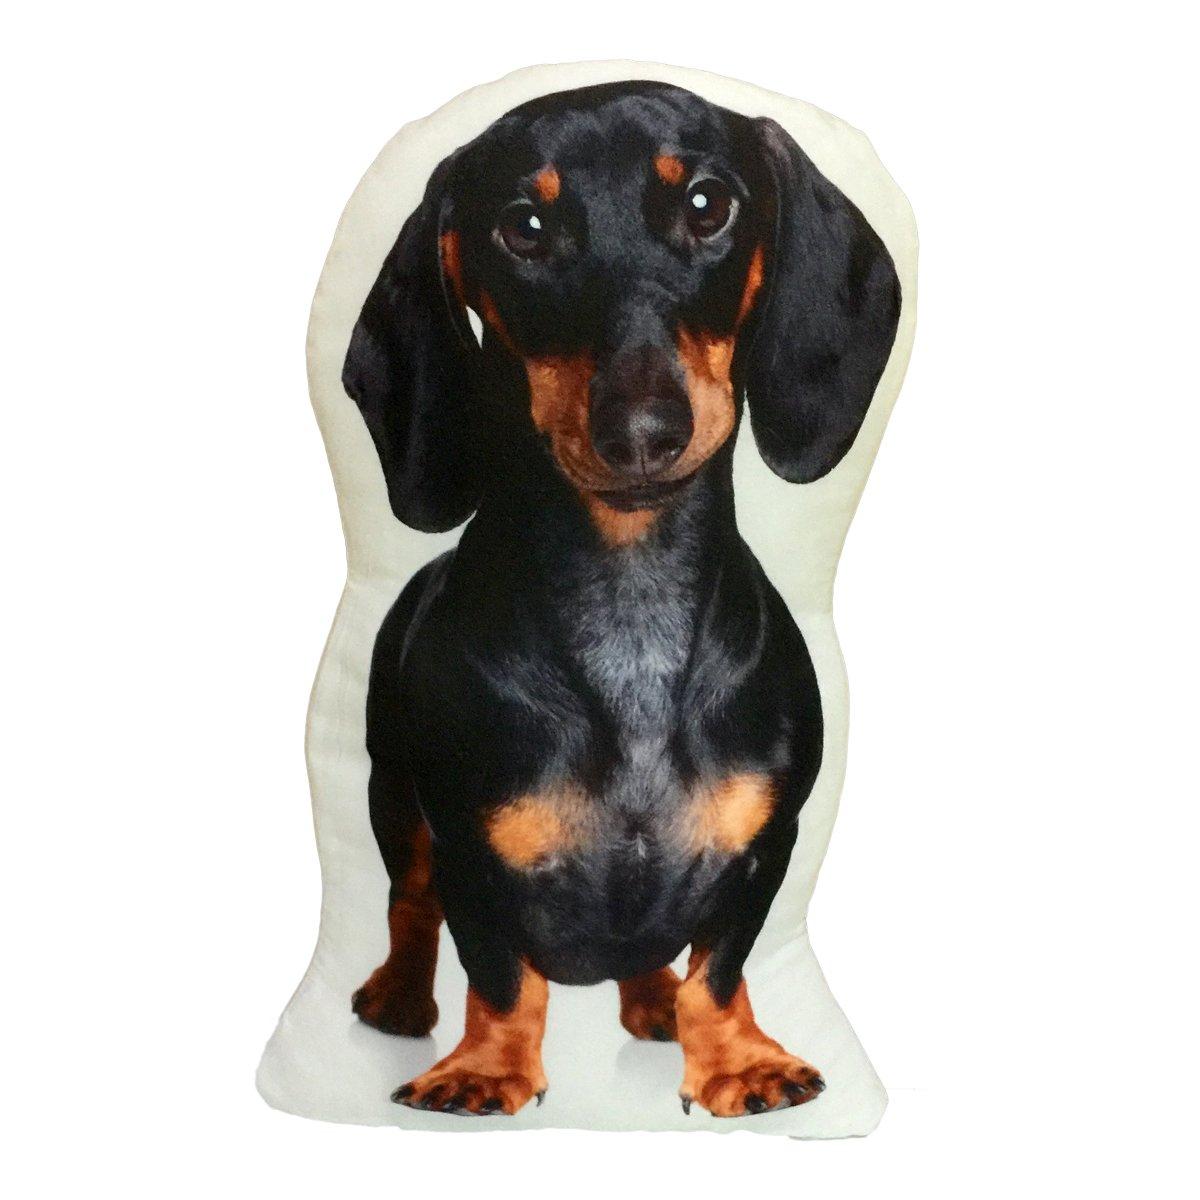 Dachshund Stuffed Weiner Hot Dog Throw Pillow Decorative Gift